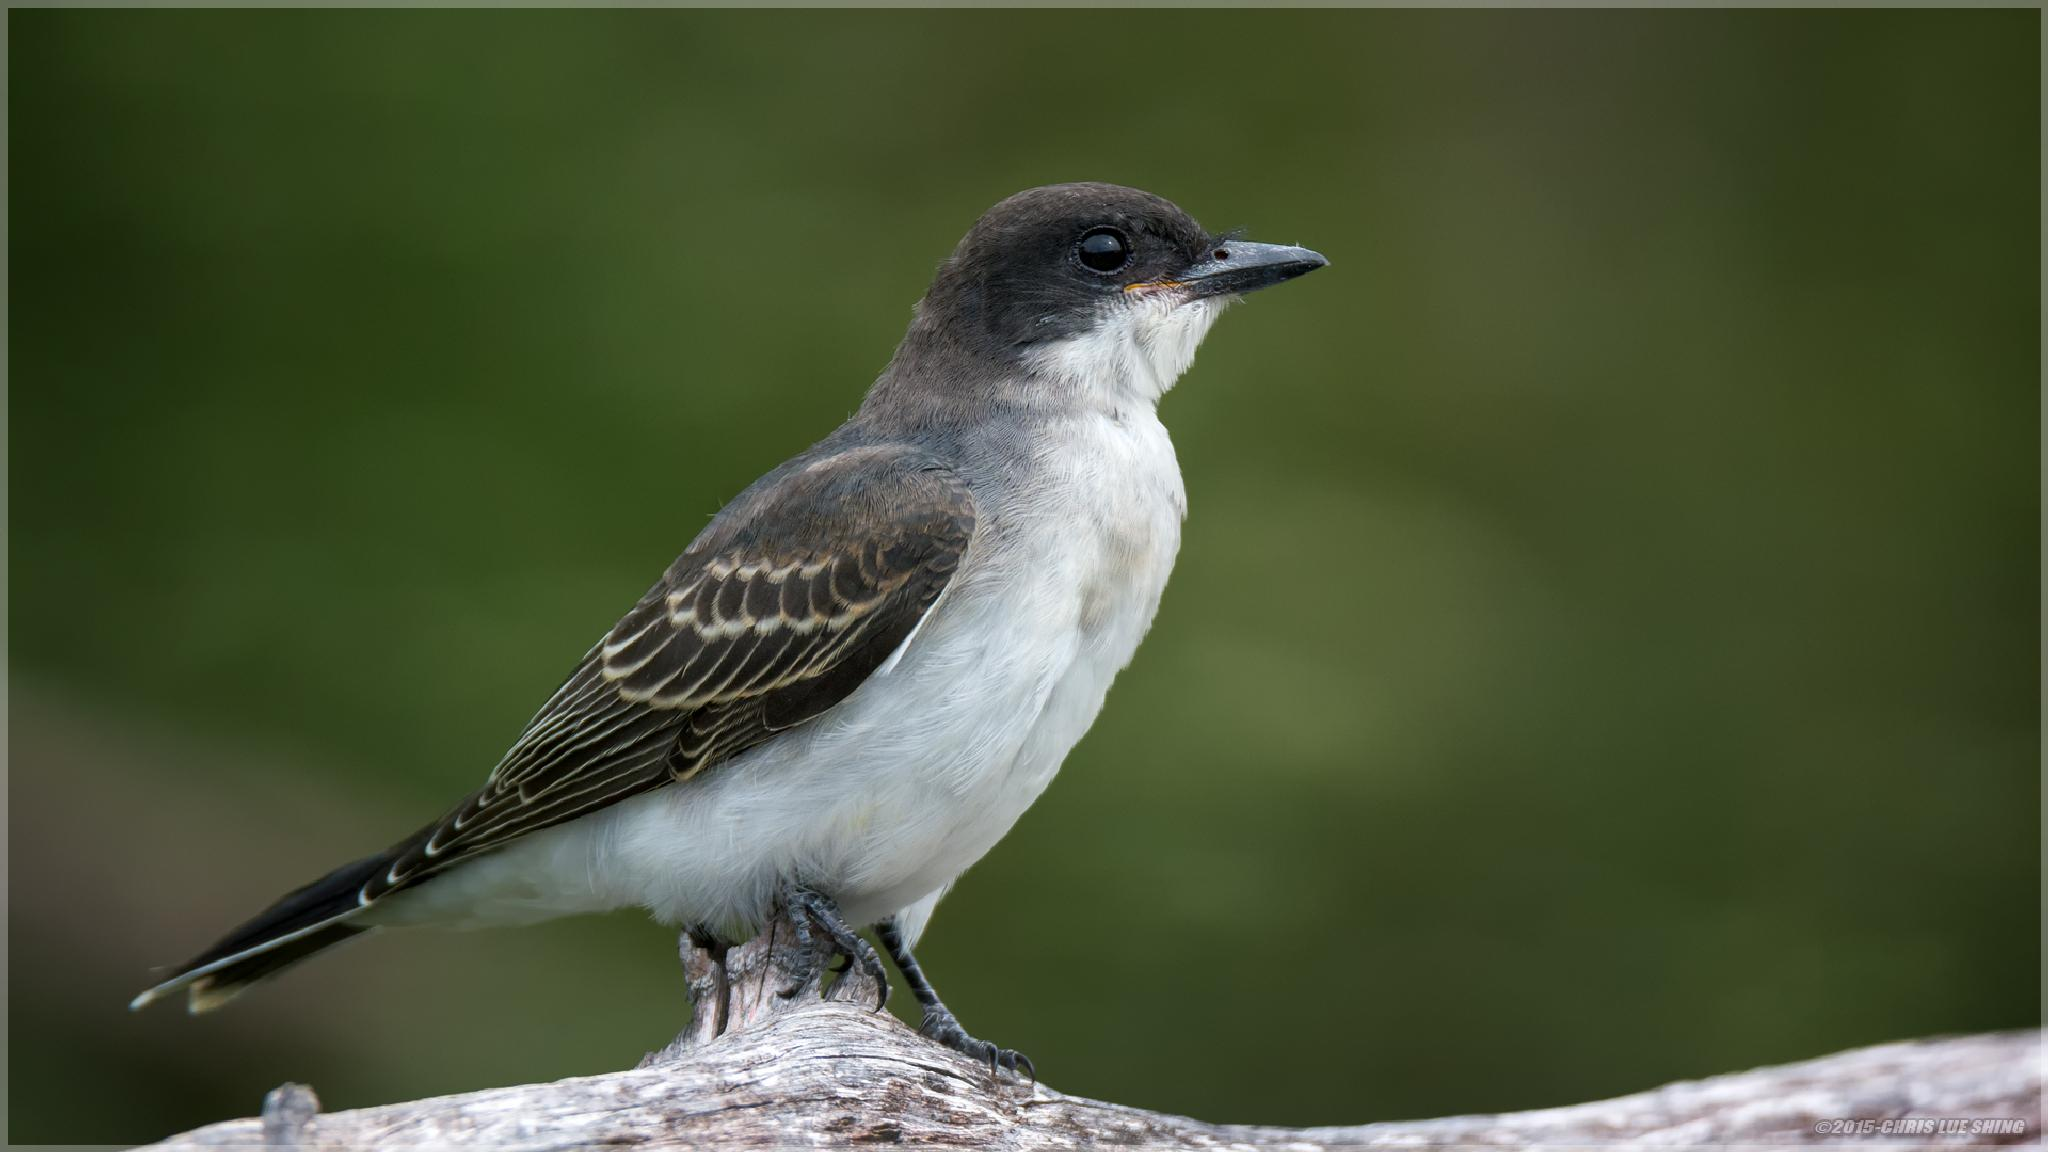 Kingbird by Chris Lue Shing